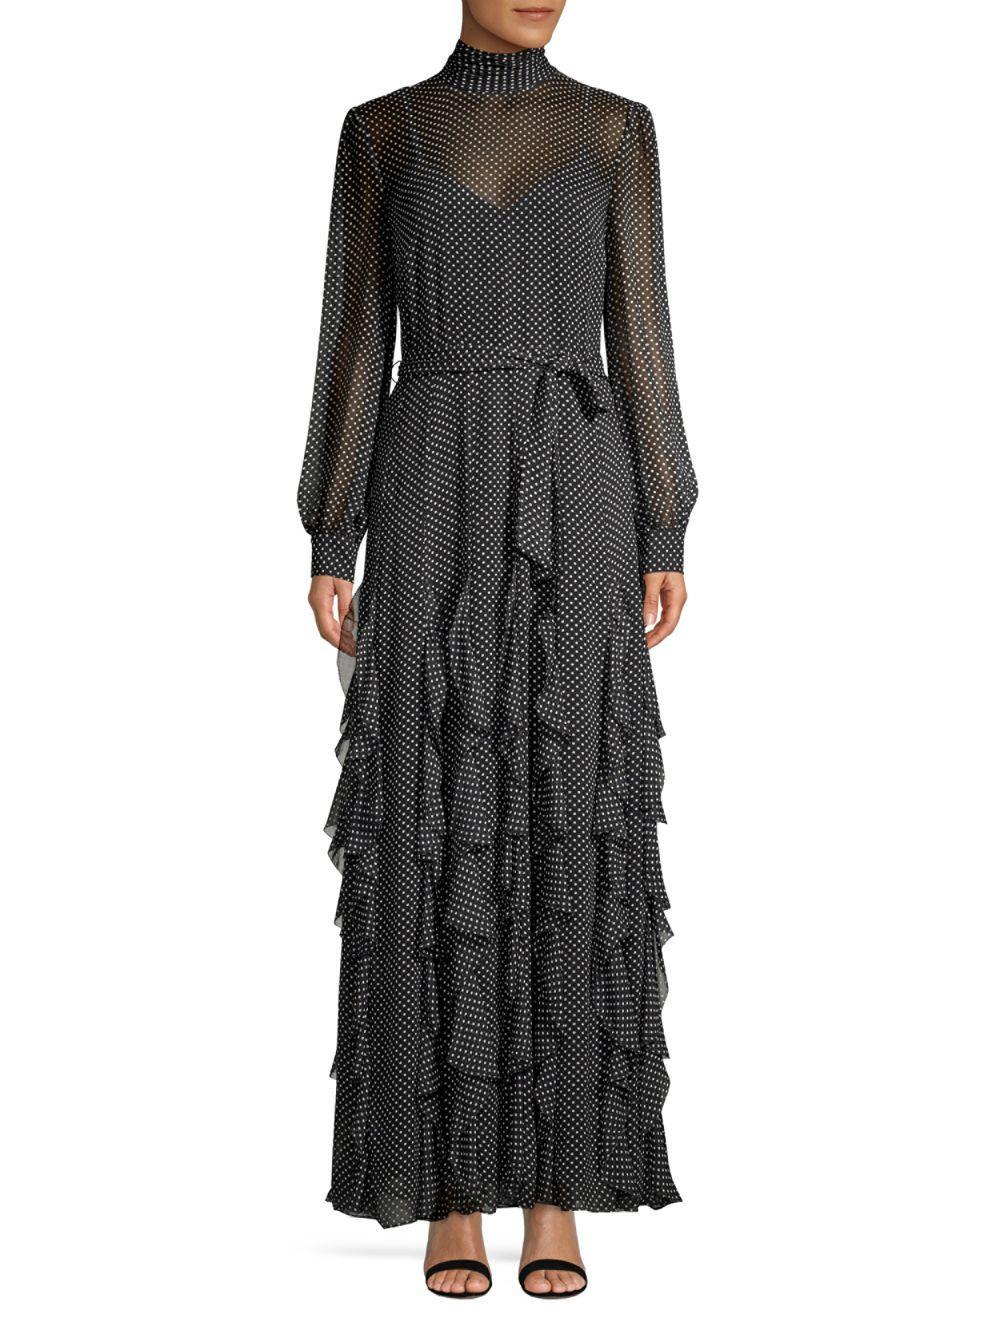 3c72028d632 Joie Cordula Silk Polka Dot Ruffle Dress in Black - Save 70% - Lyst